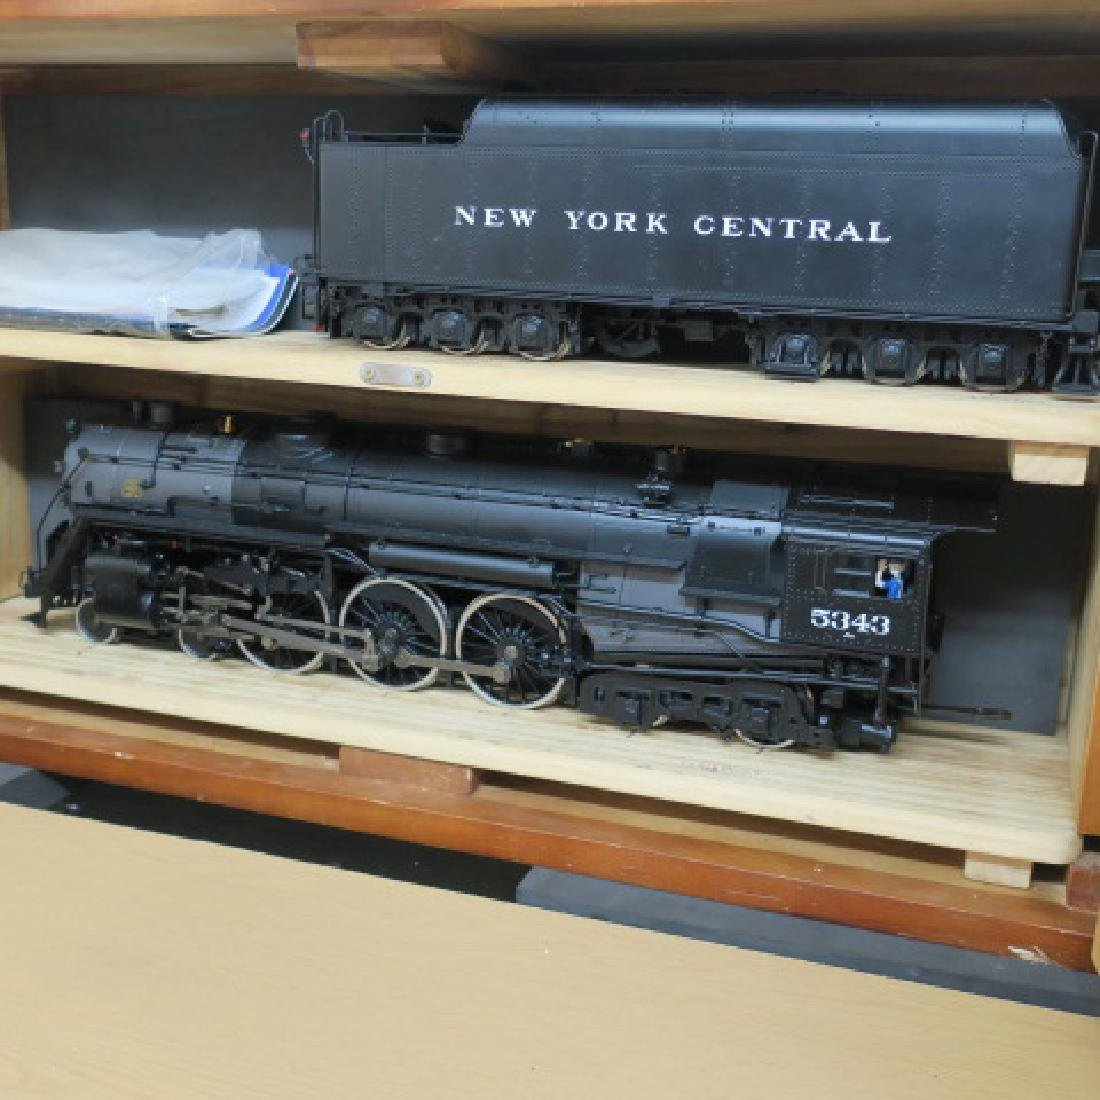 USA TRAINS R20002, NYC J1e Hudson Locomotive & Tender: